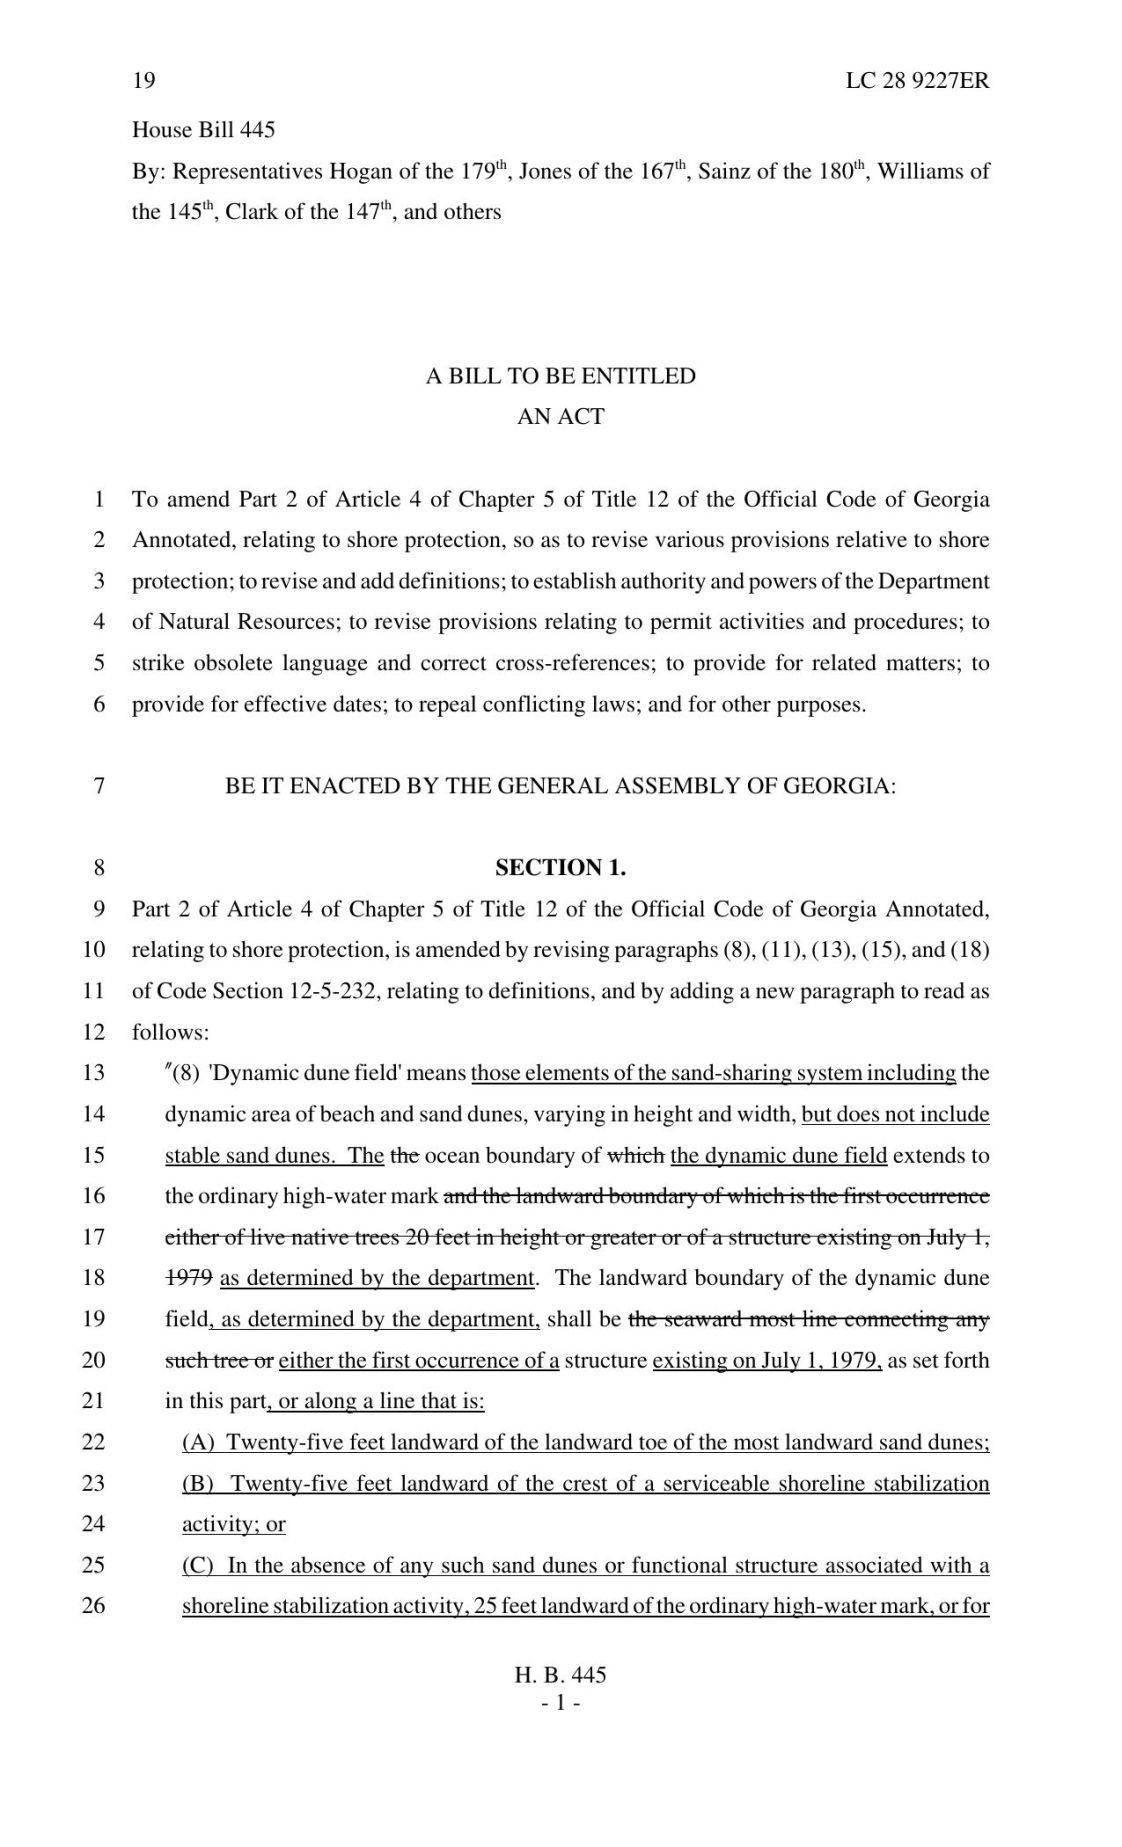 House Bill 445